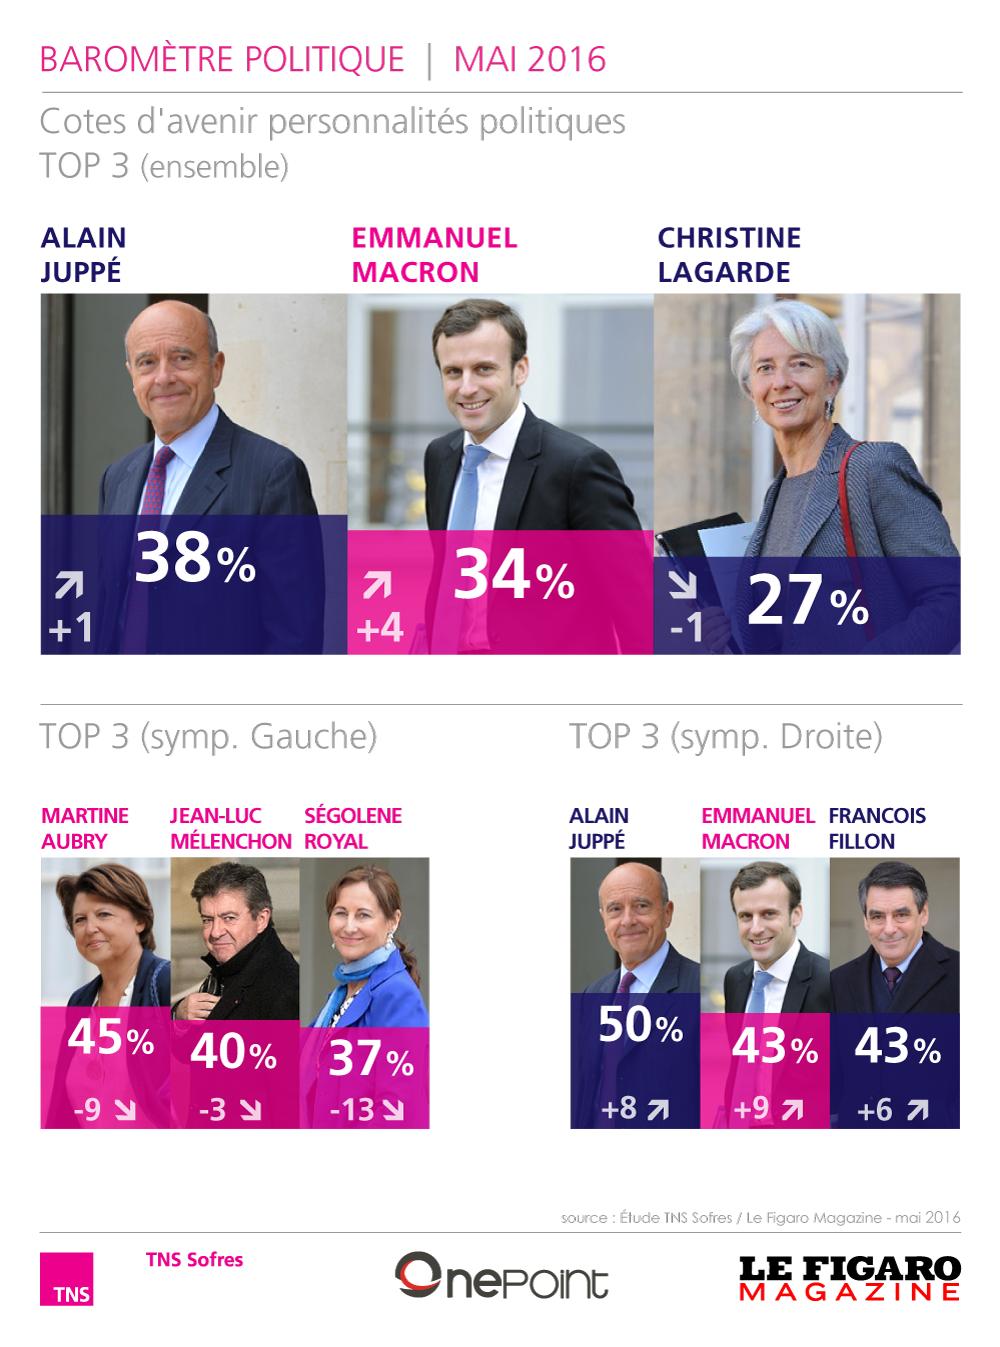 Baromètre politique (mai 2016) http://www.tns-sofres.com/publications/barometre-politique-mai-2016